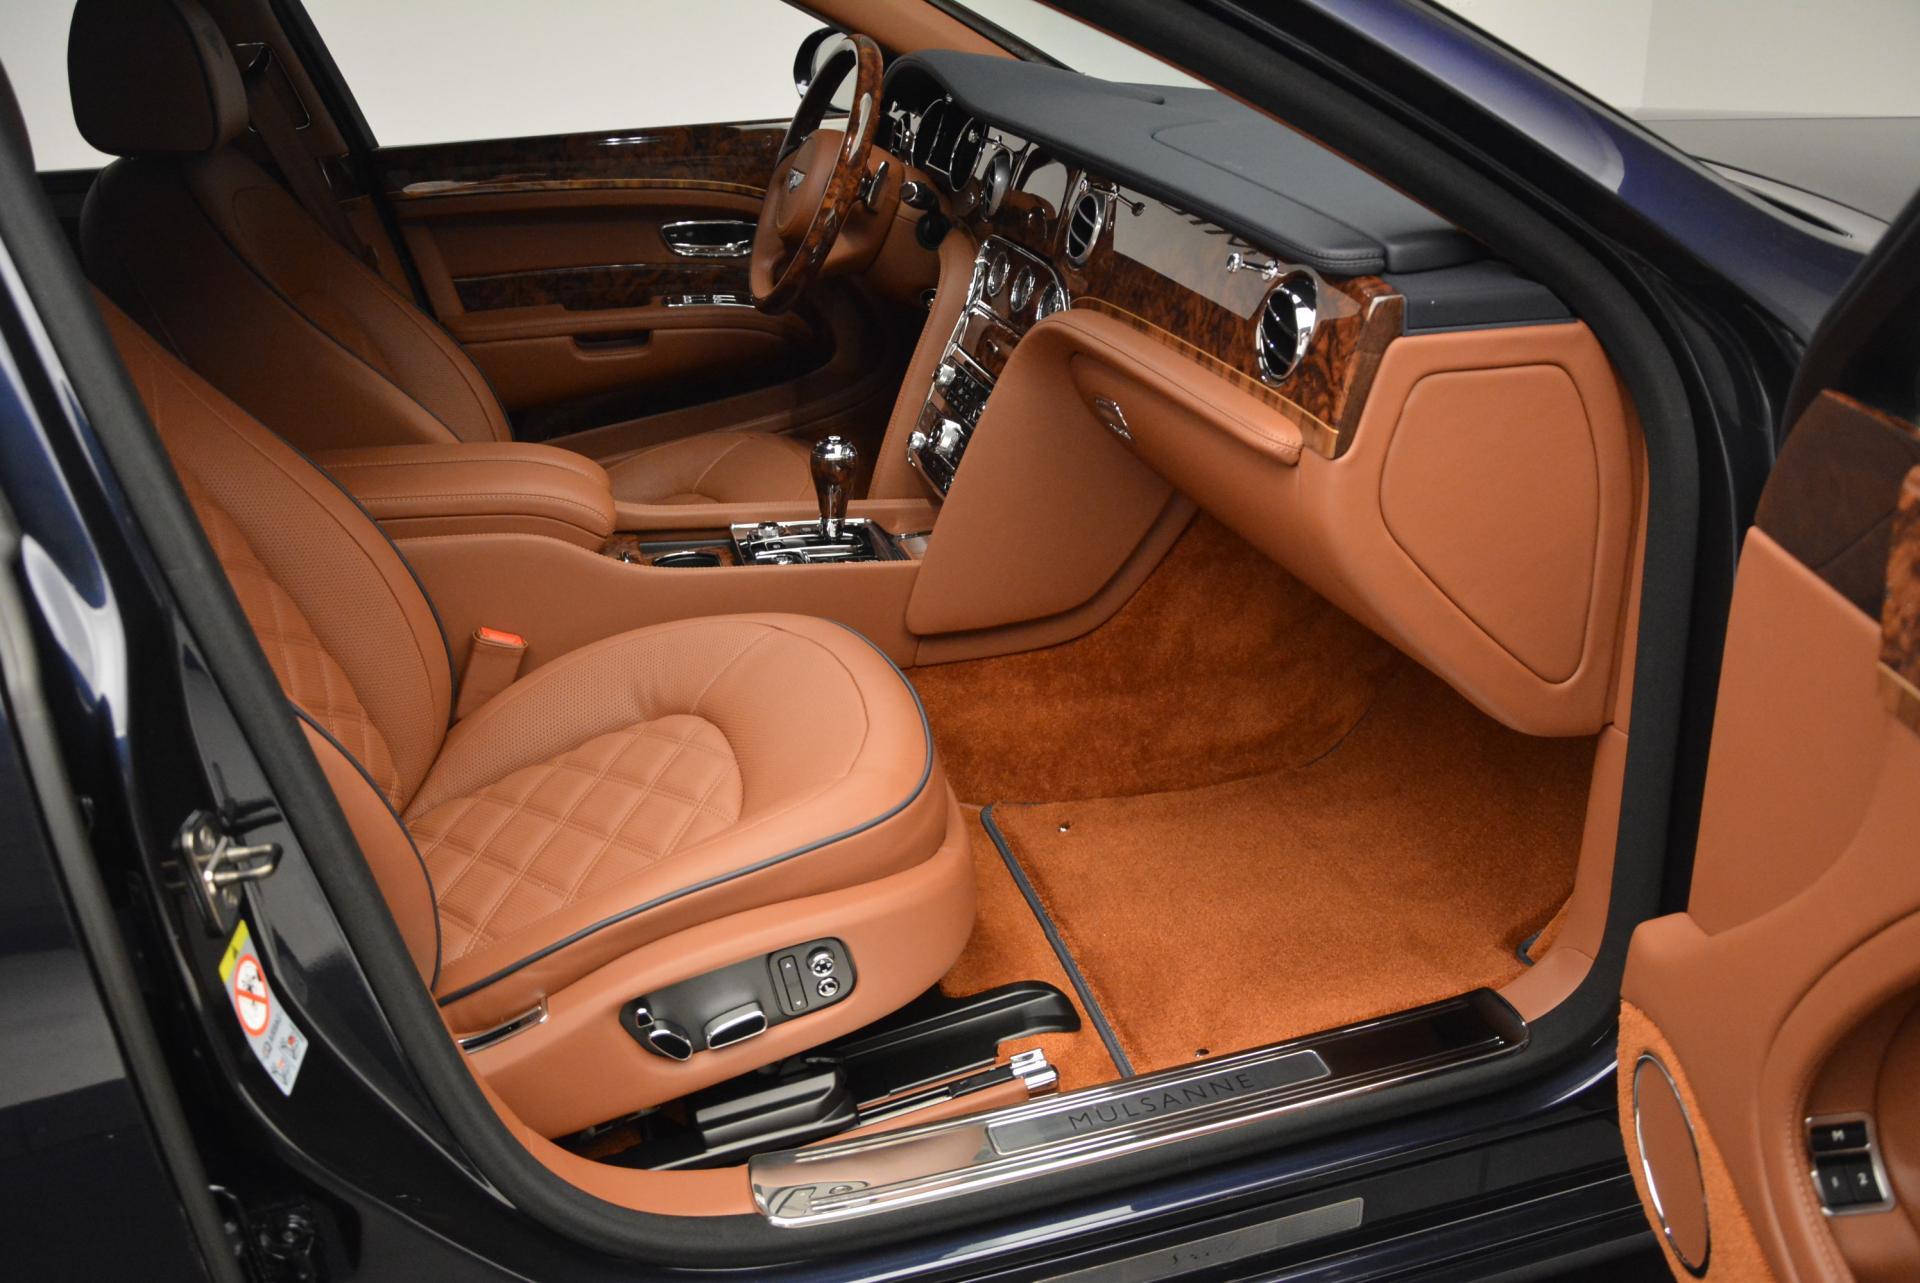 Used 2016 Bentley Mulsanne Speed For Sale In Westport, CT 31_p18